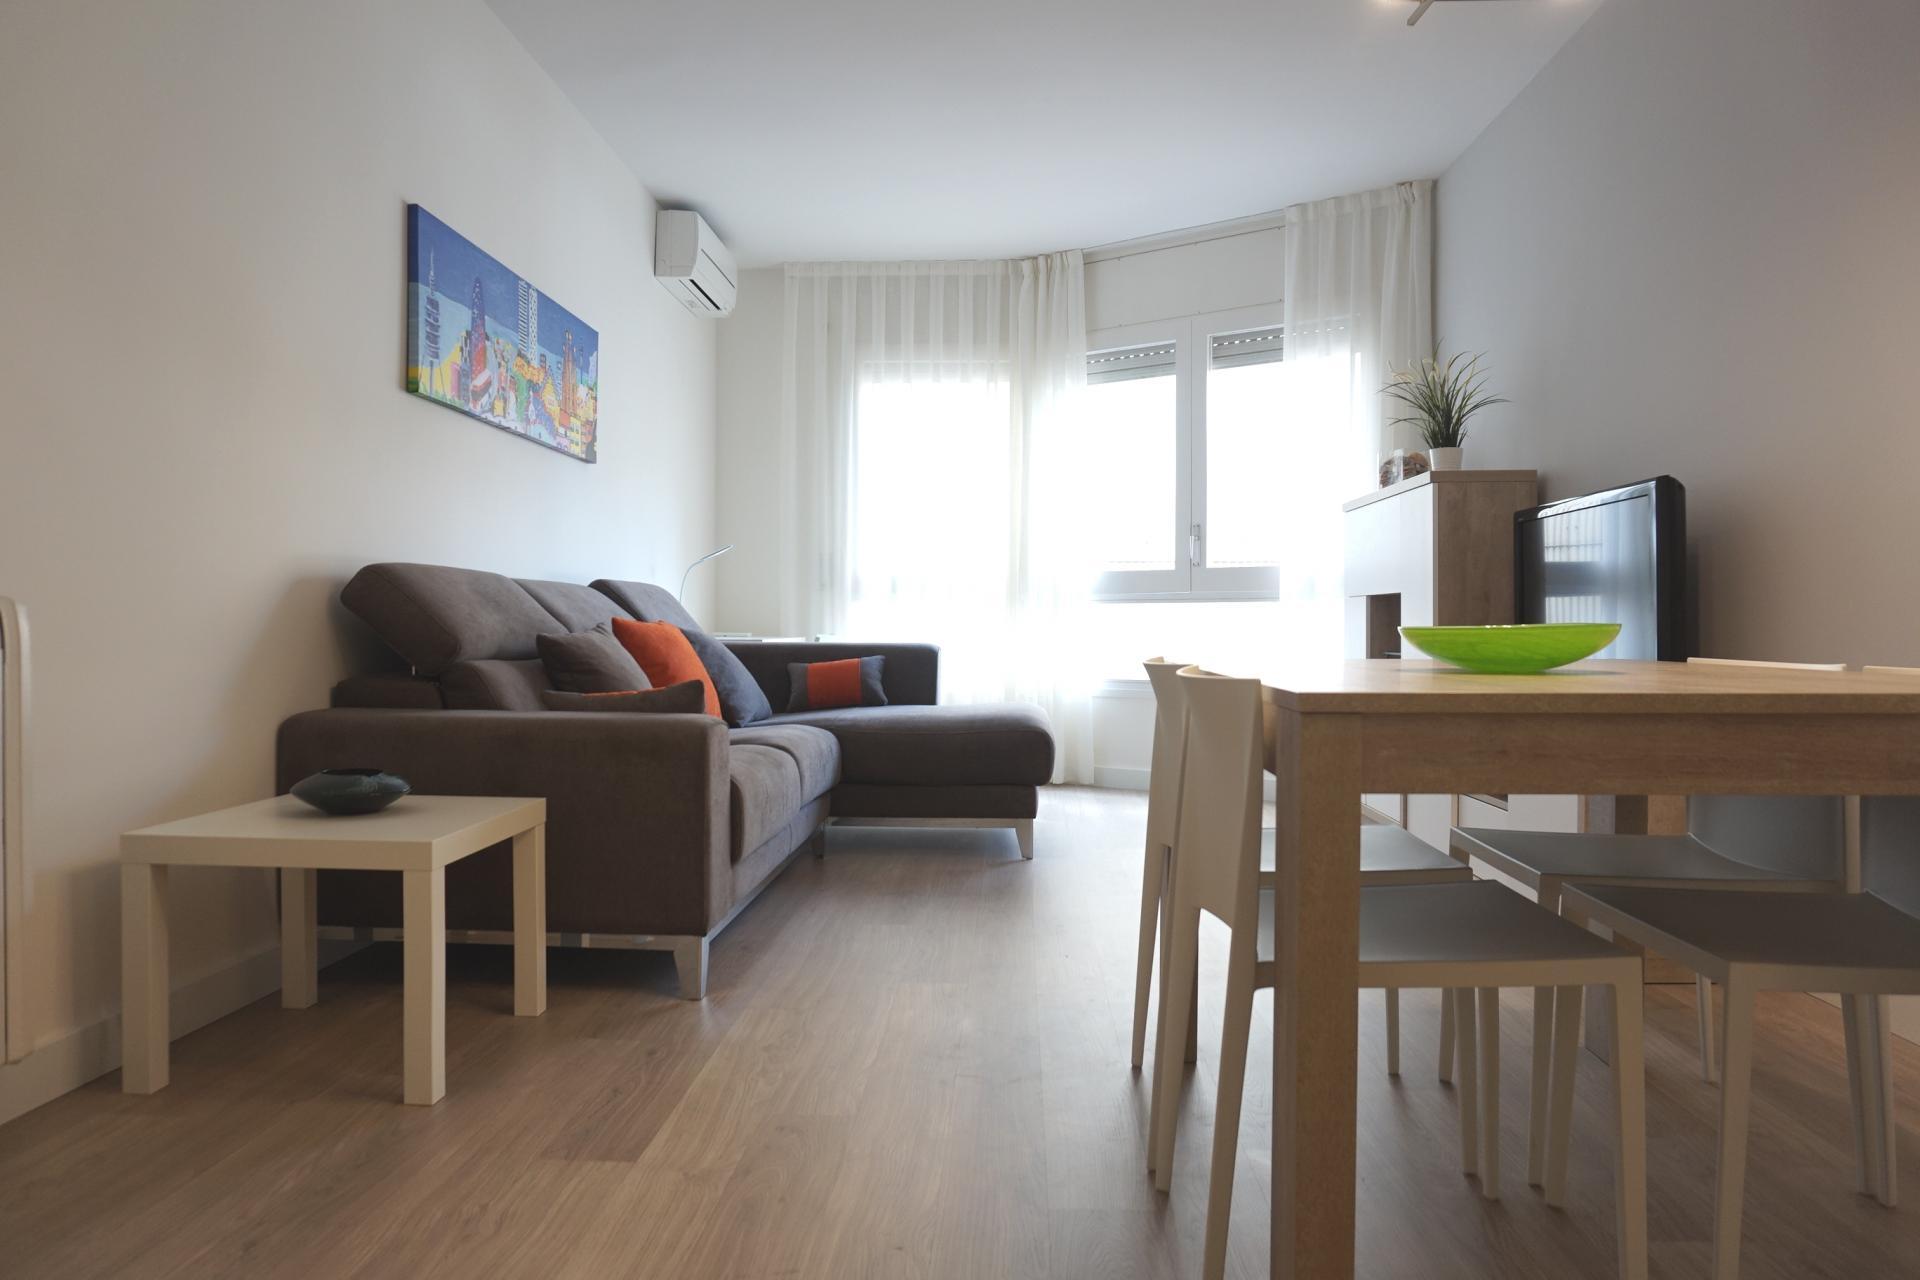 Piso en alquiler barcelona l 39 eixample rossell bruc - Alquiler pisos barcelona eixample ...